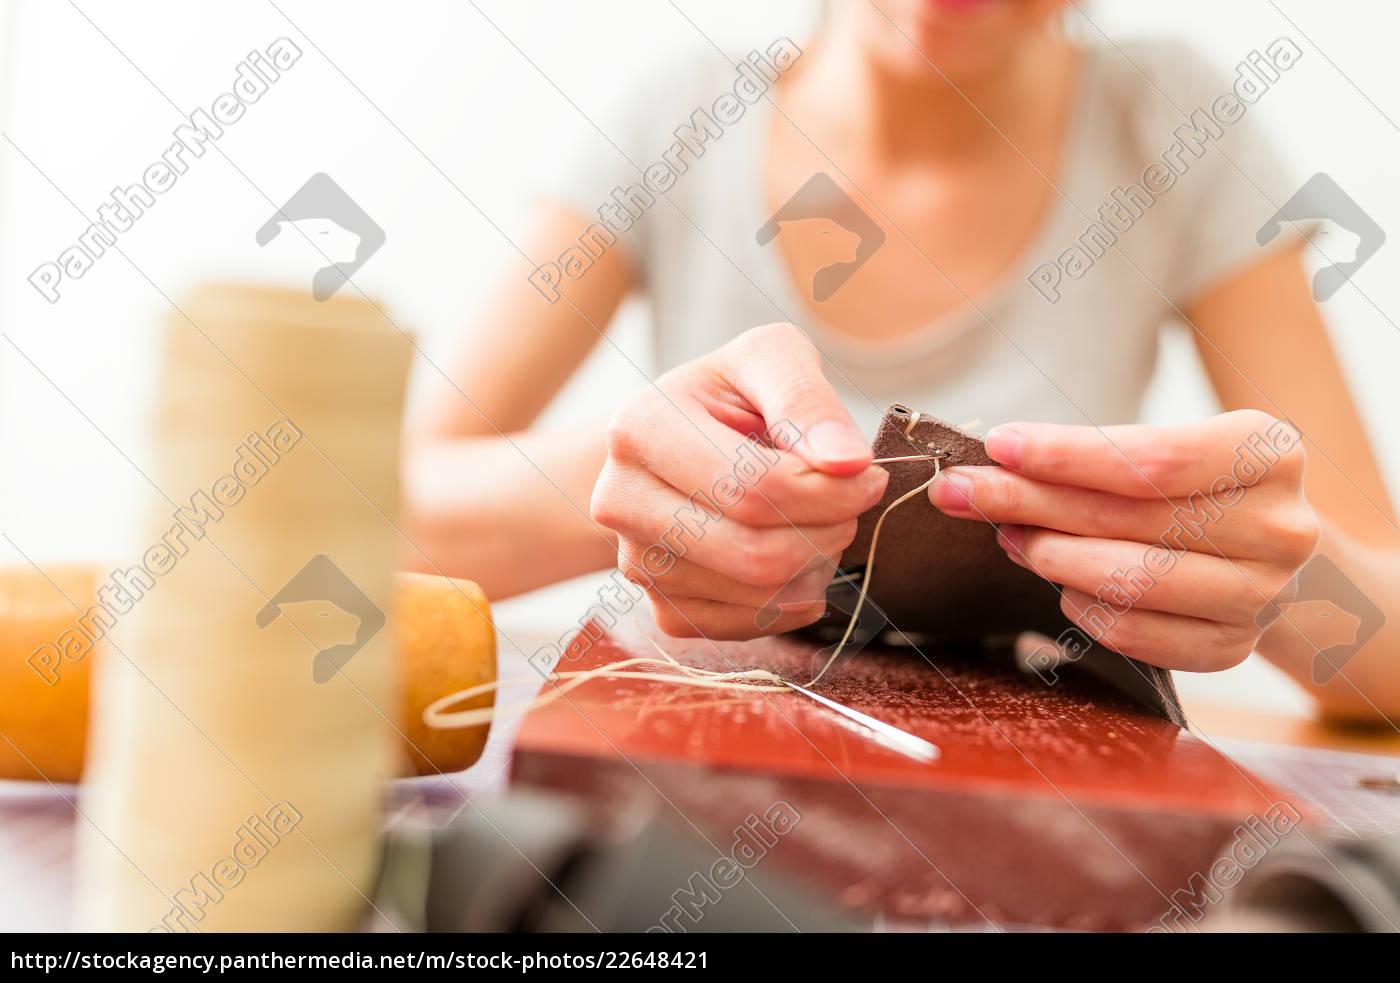 leather, handbag, craftsman, at, work, in - 22648421